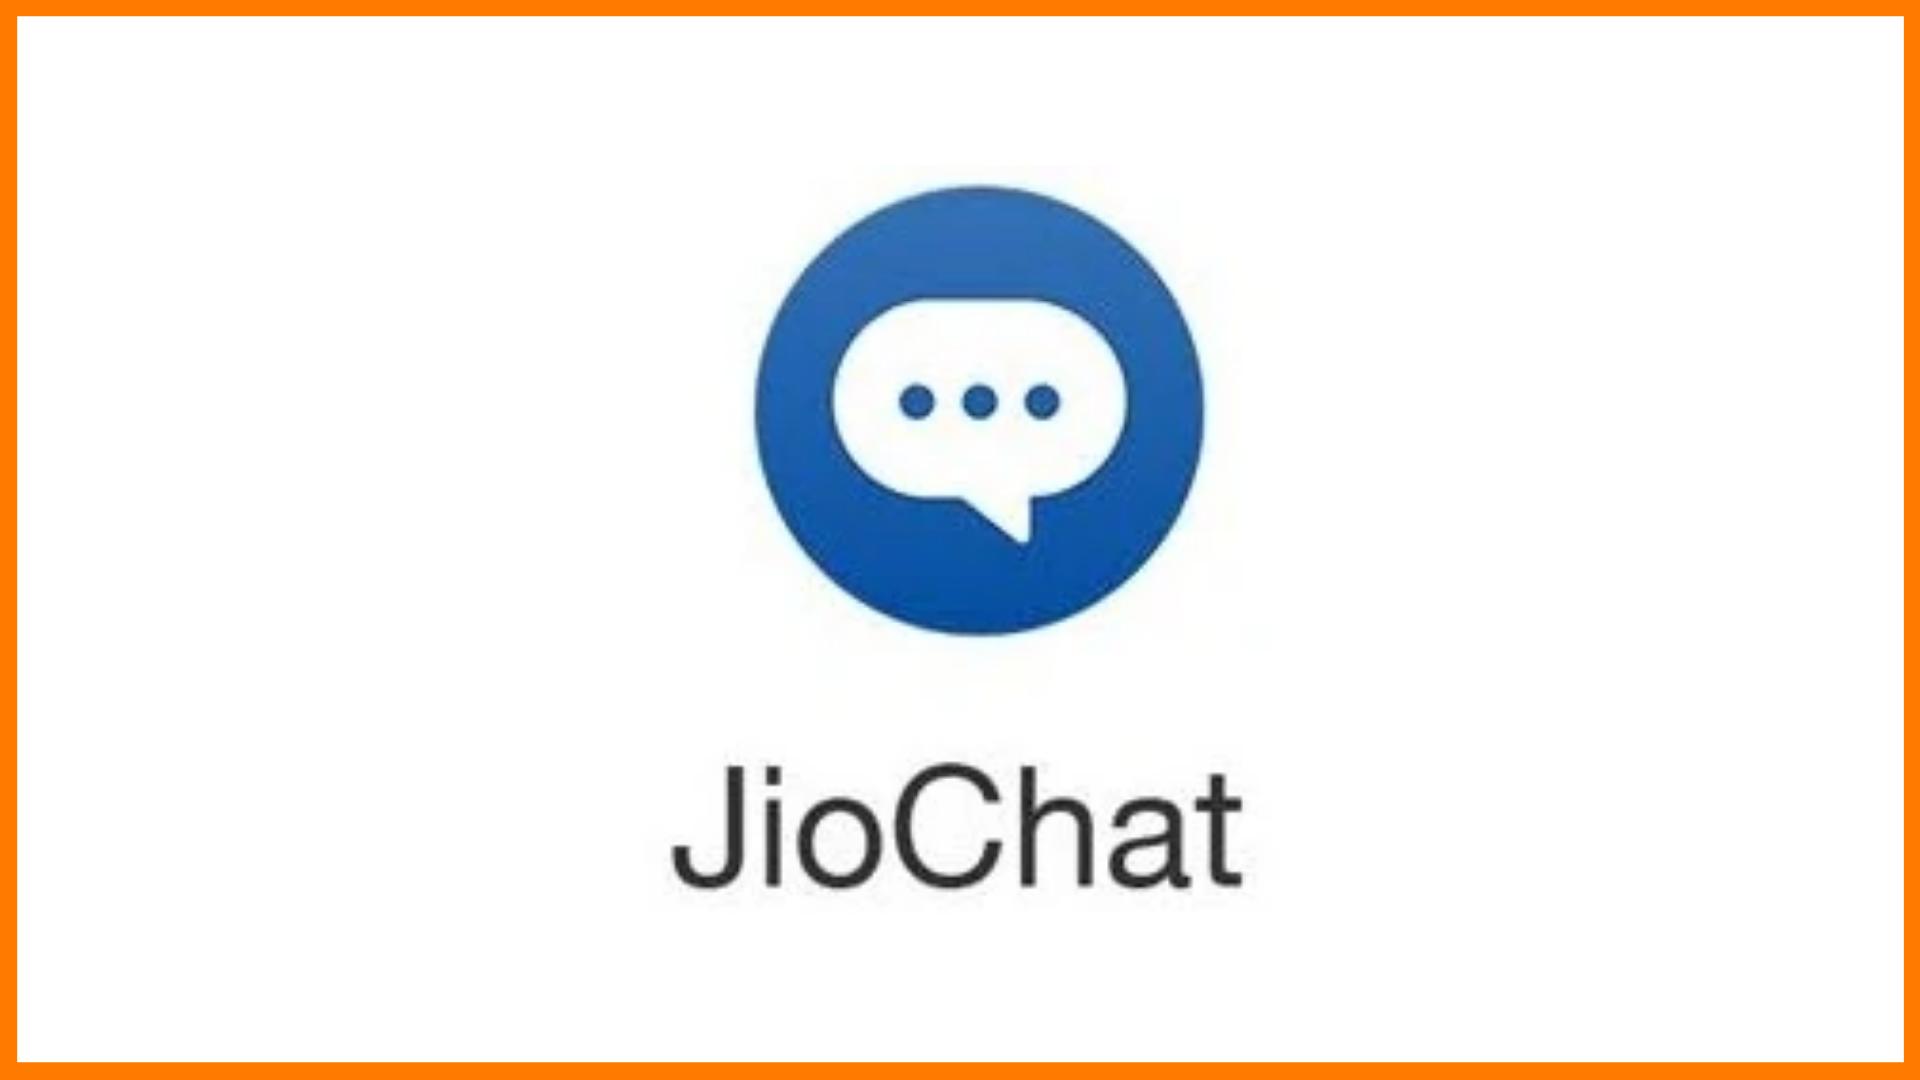 JioChat Logo